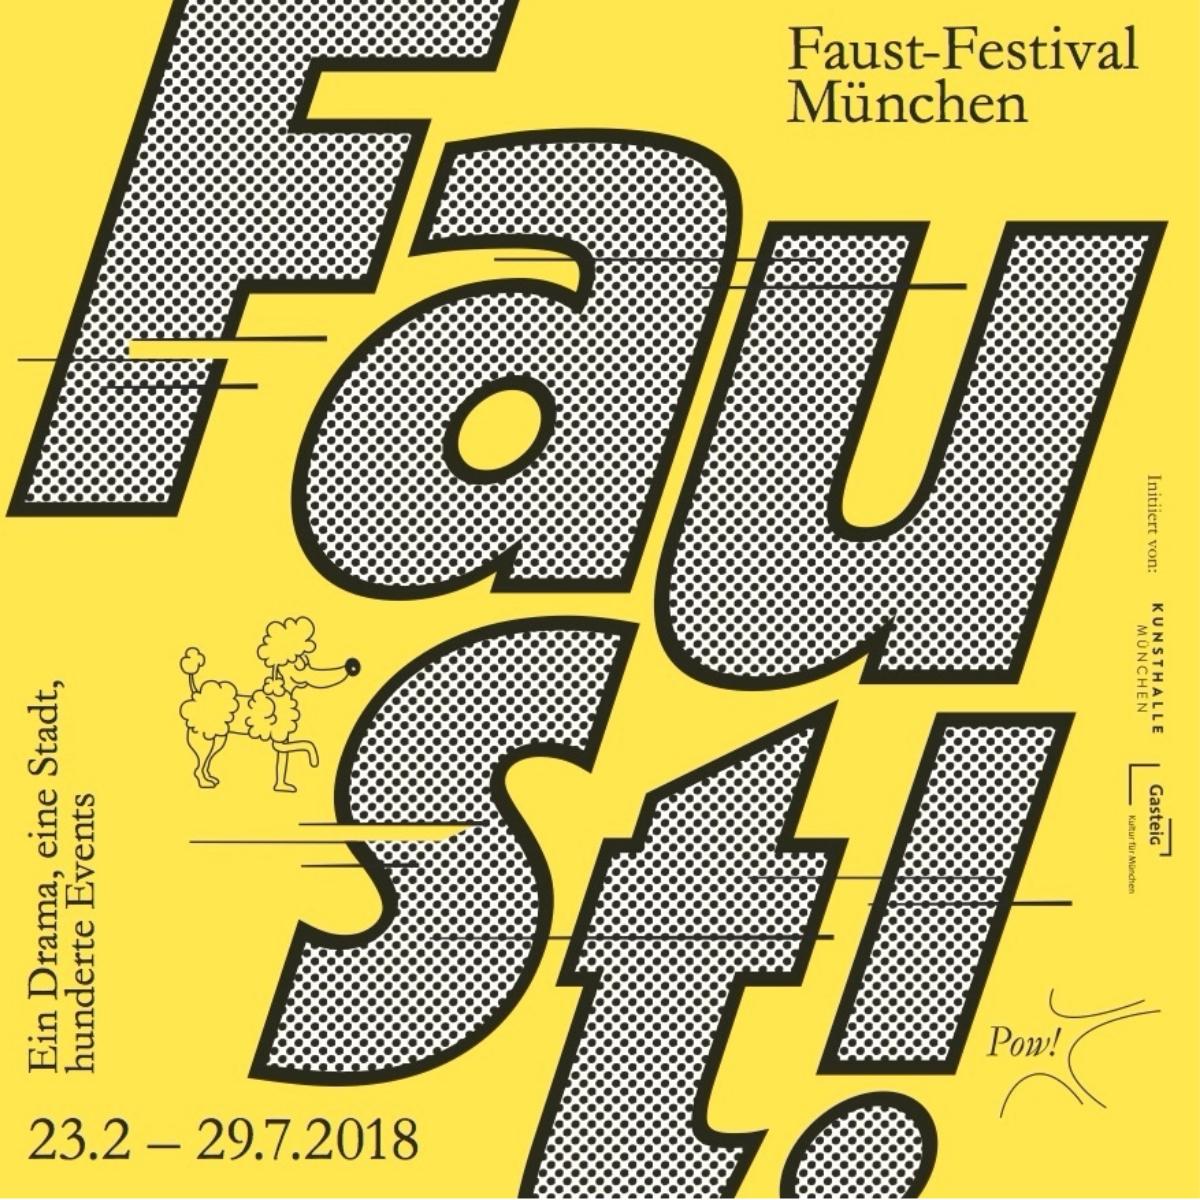 Faust Festival München